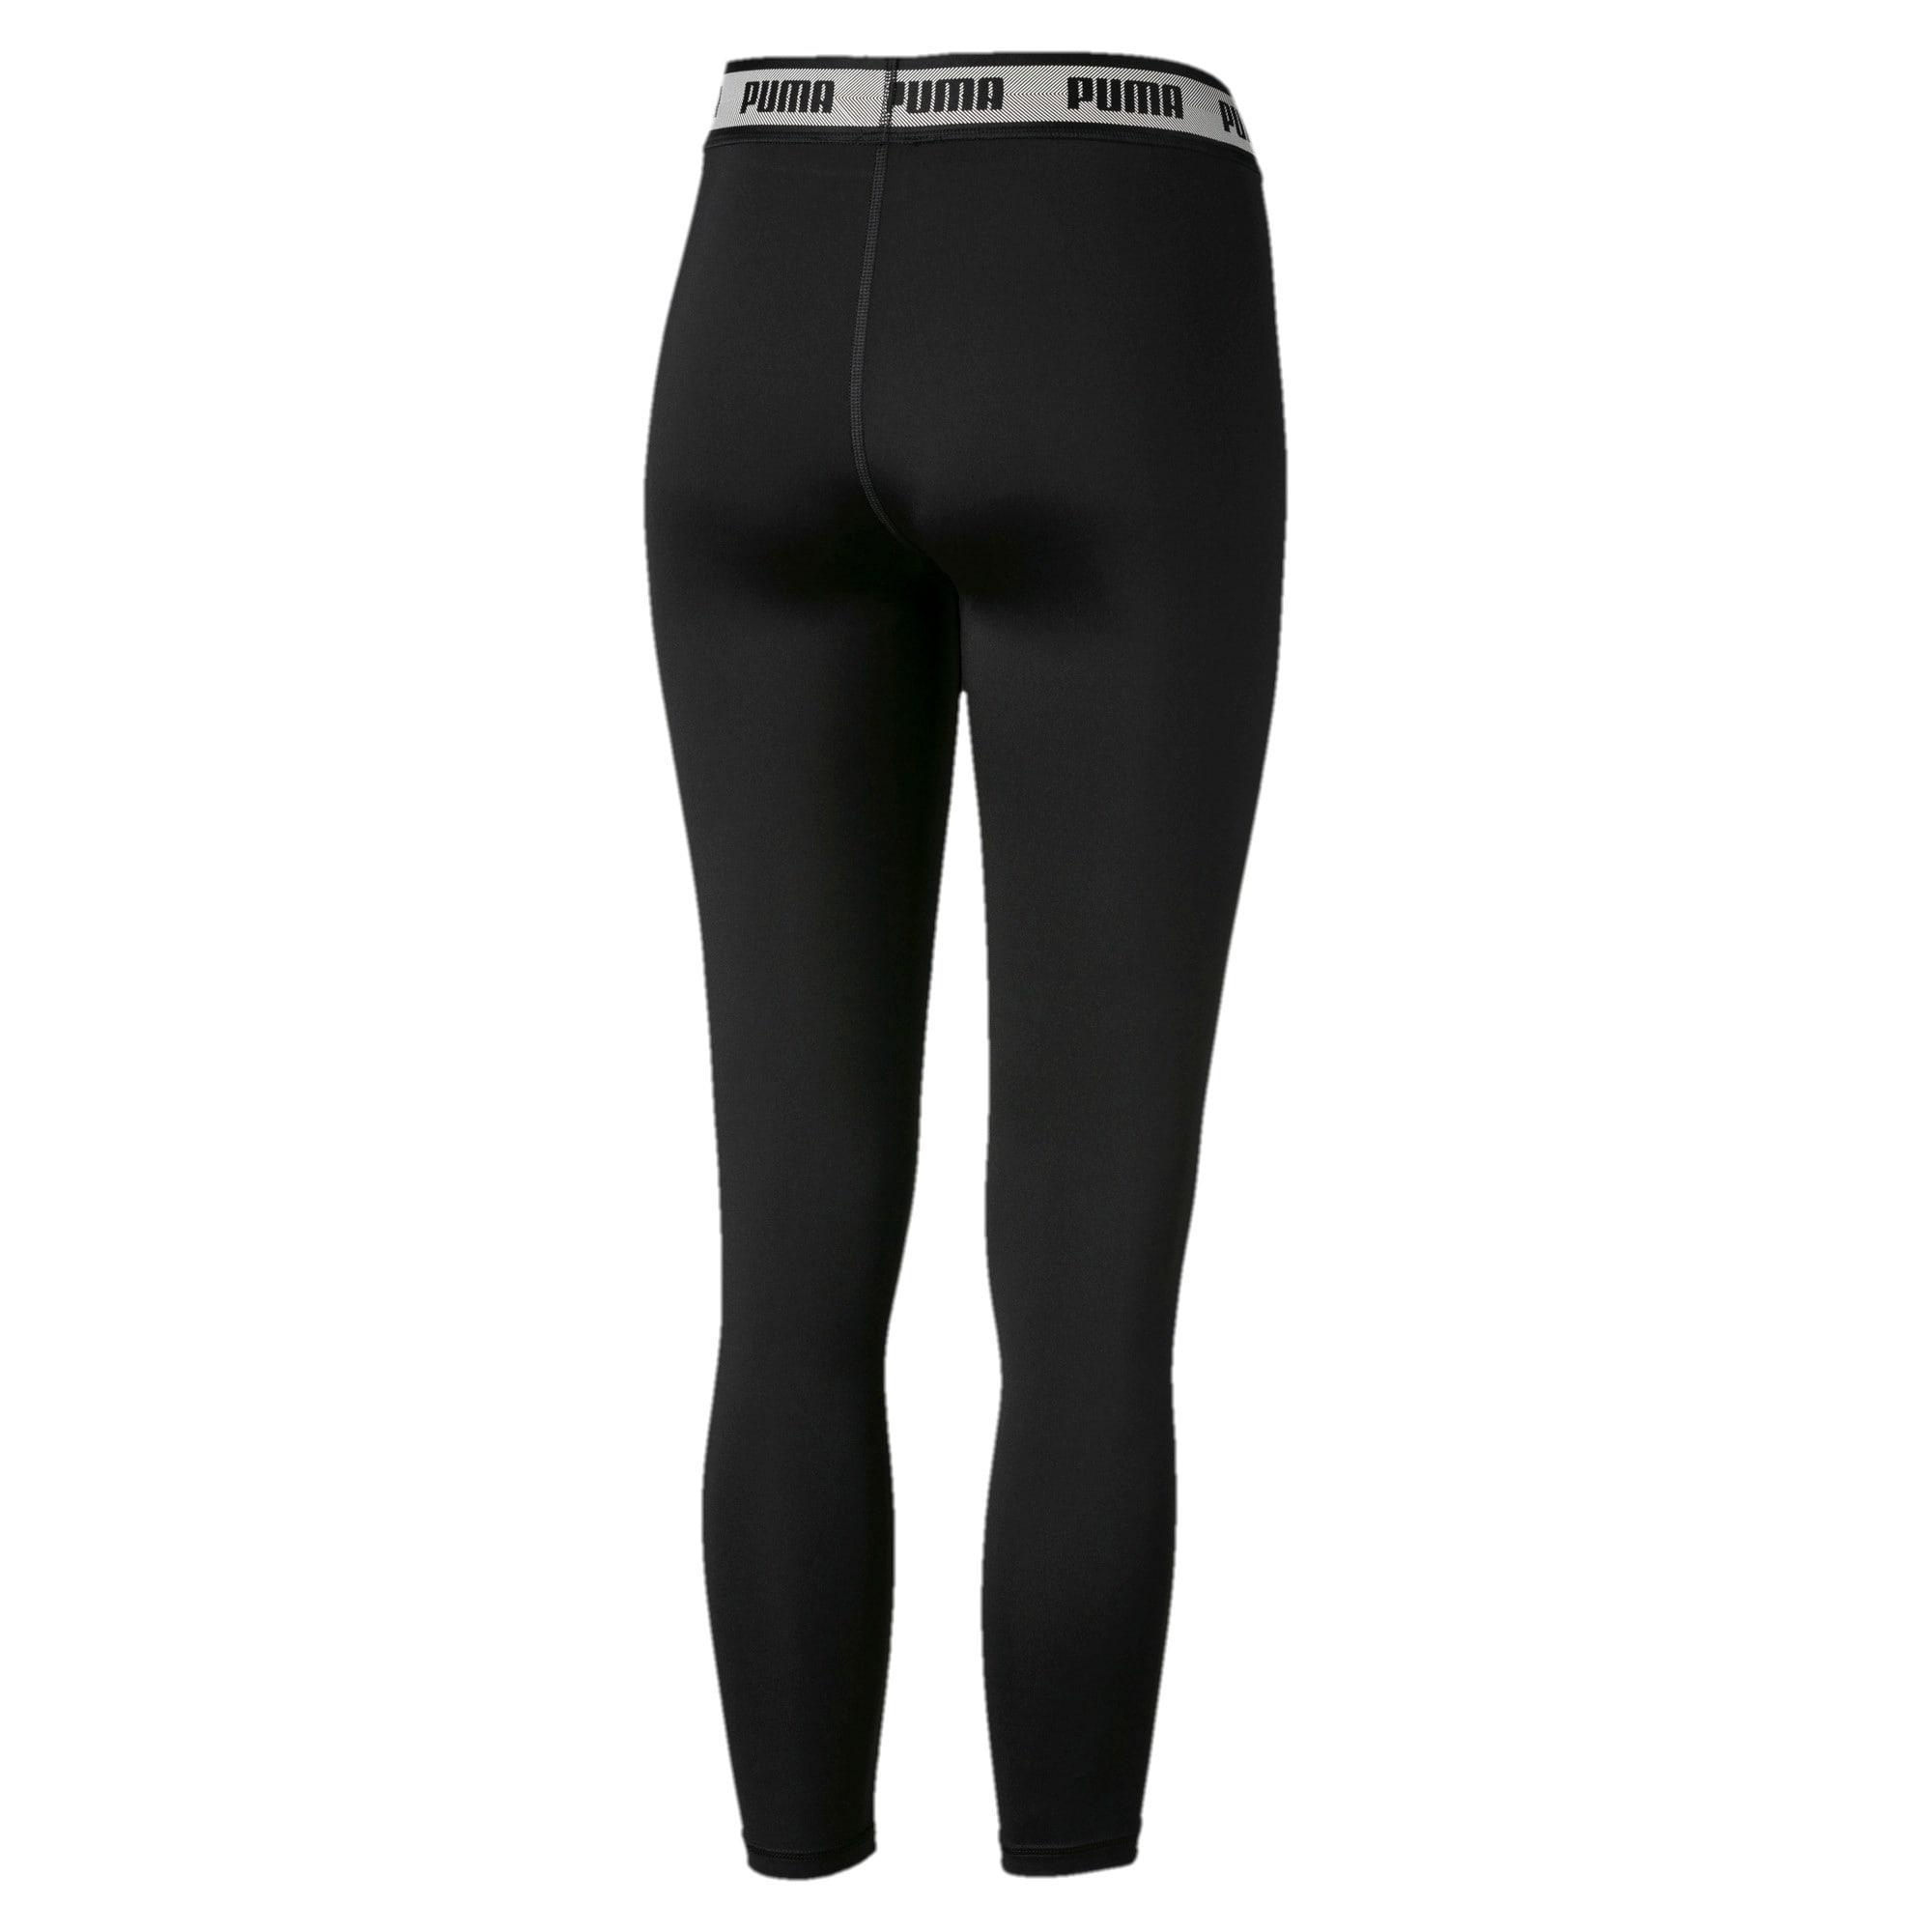 Thumbnail 5 of SOFT SPORTS Women's Leggings, Puma Black, medium-IND